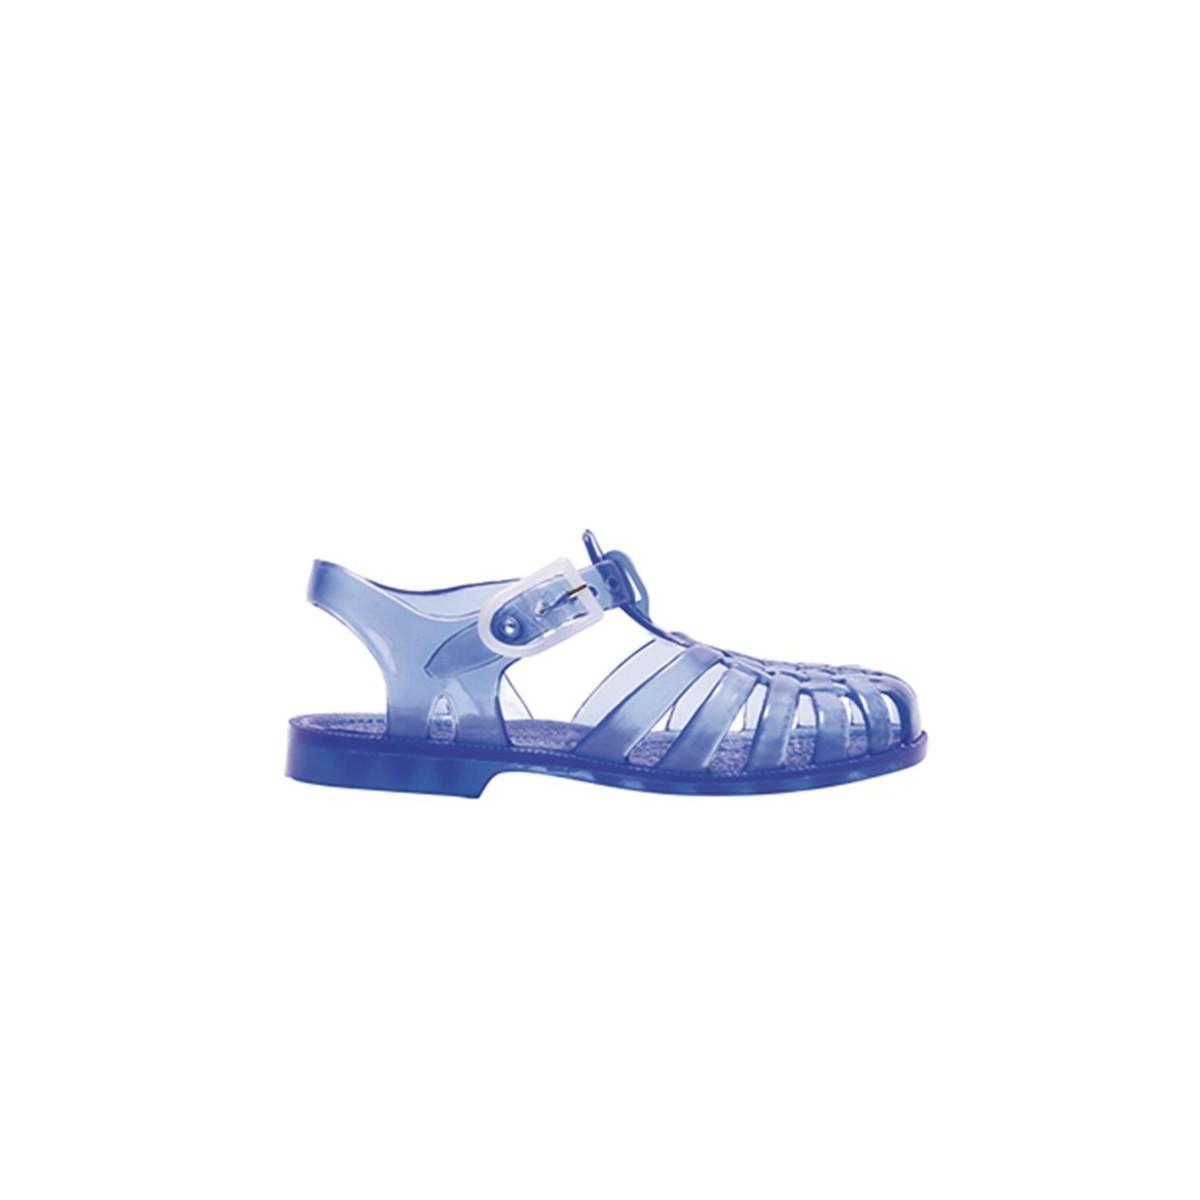 Sandale Méduse cobalt